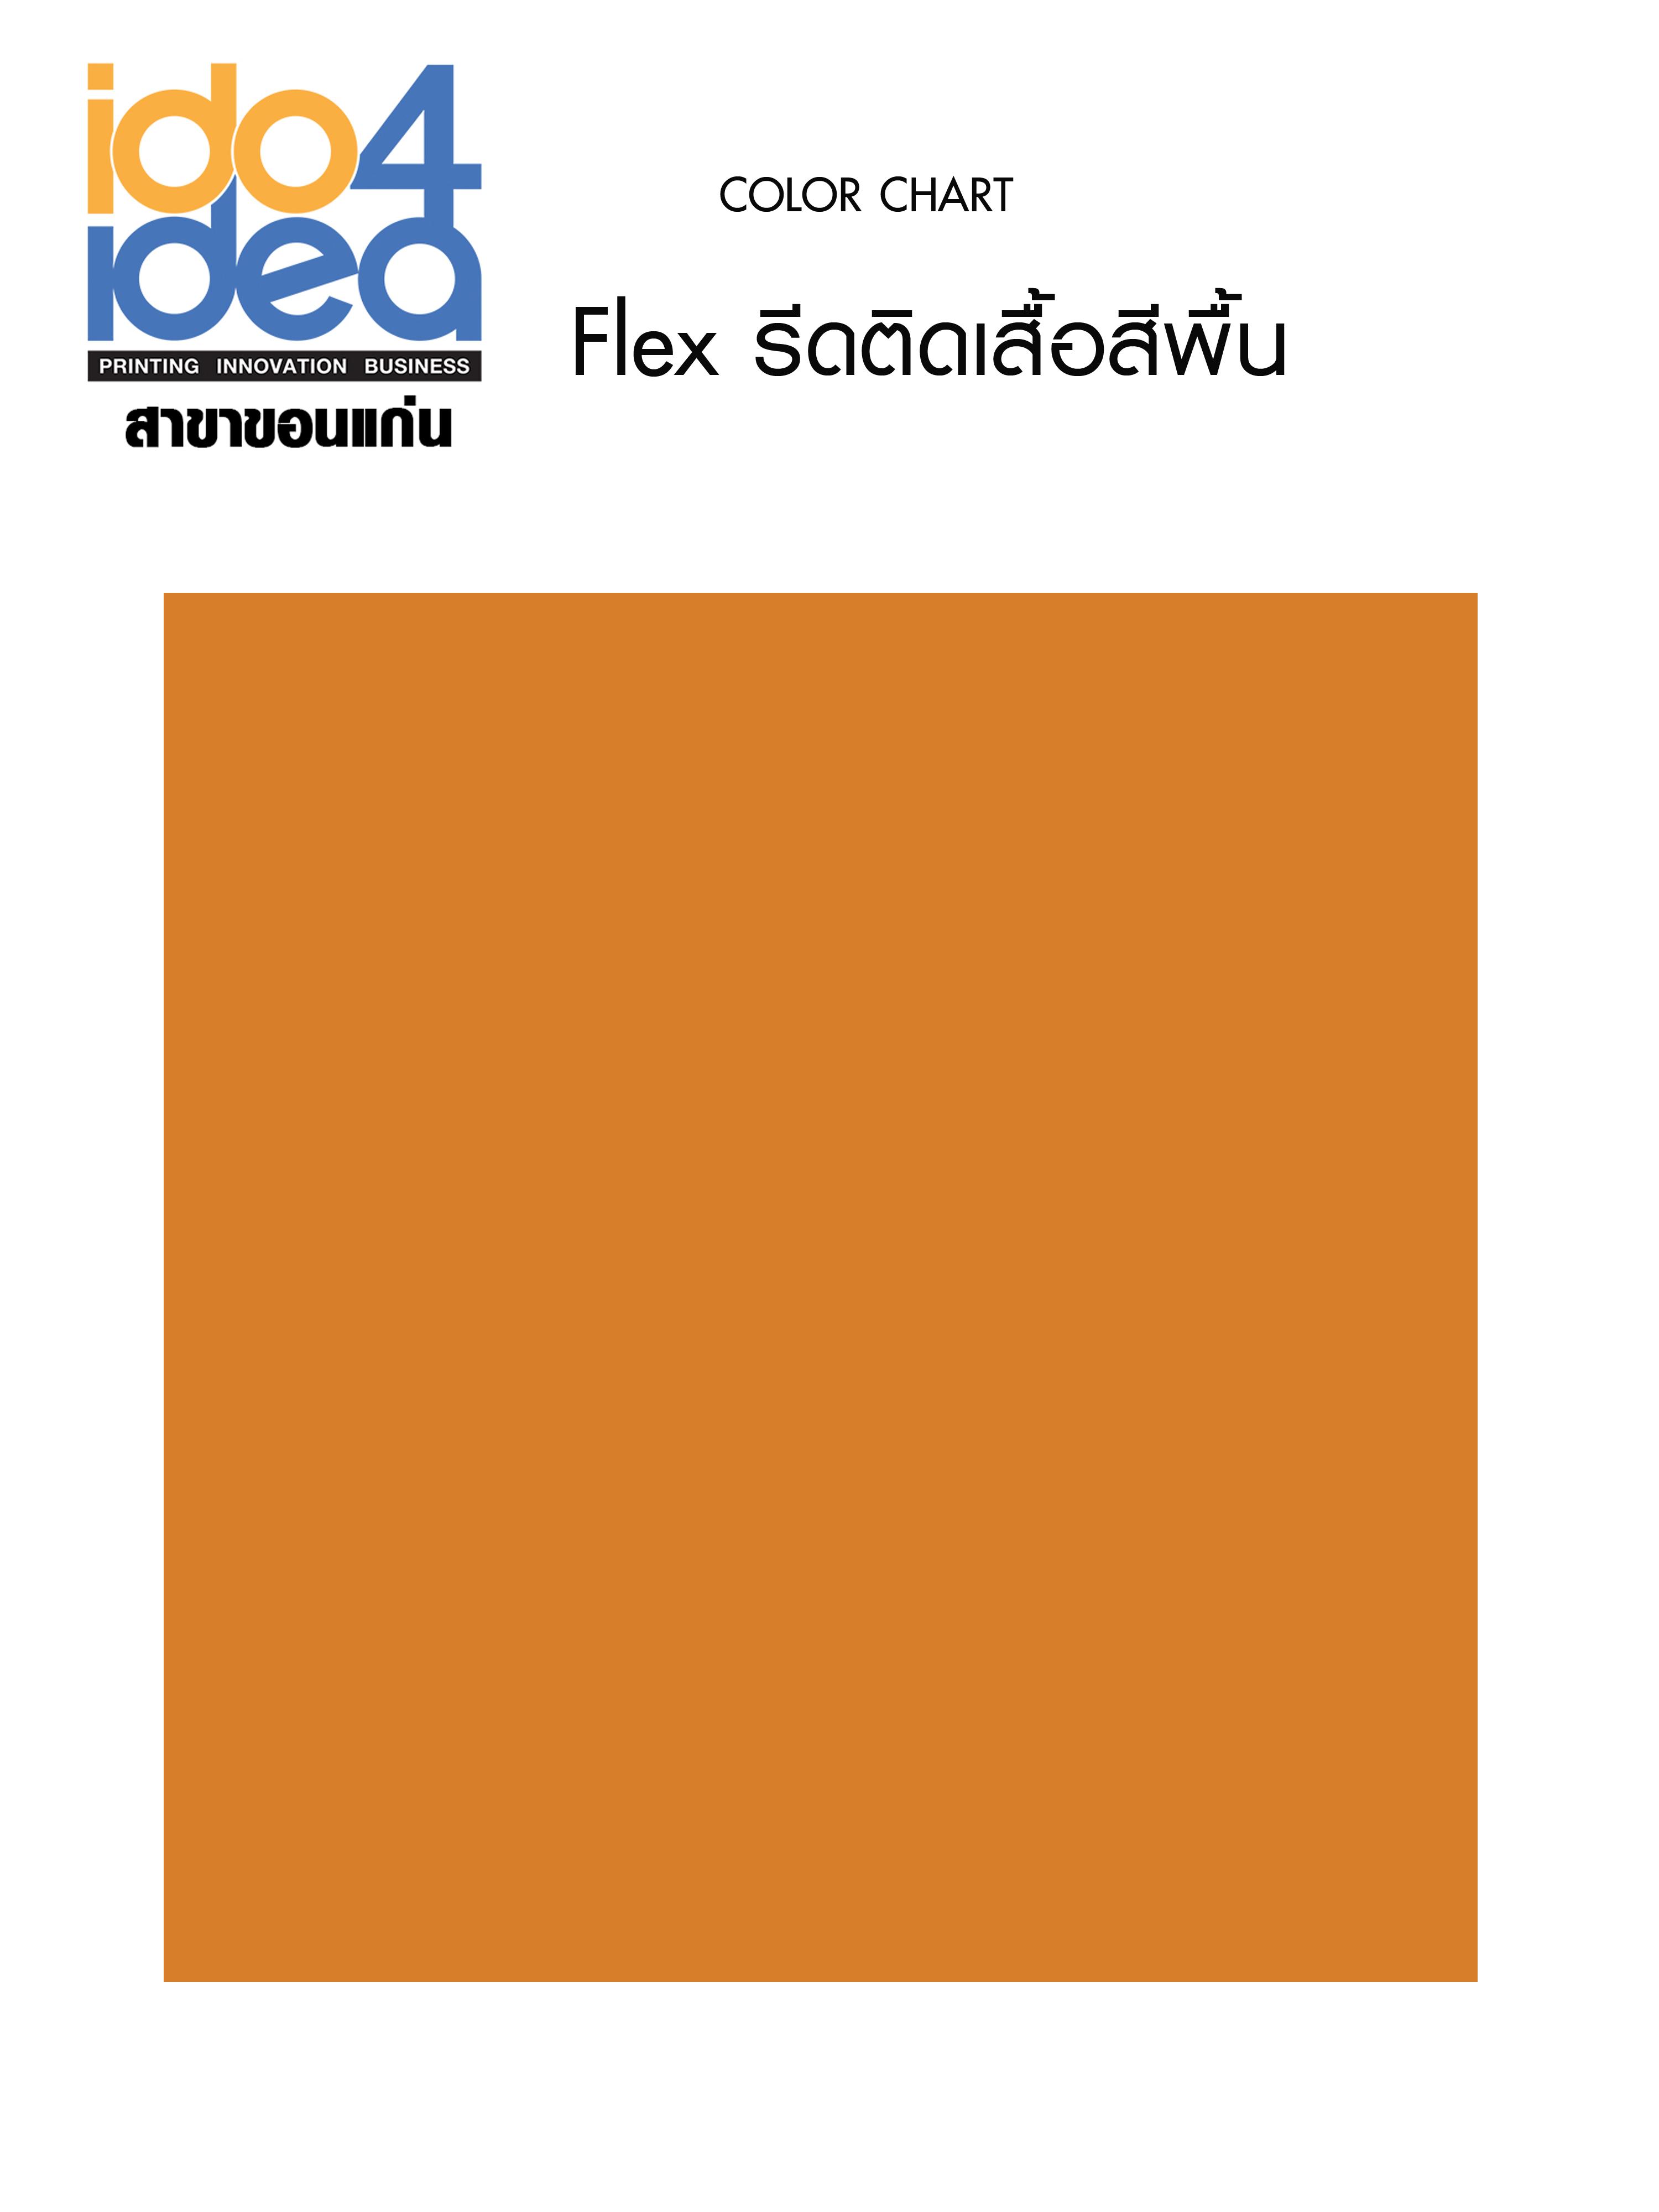 Flex Pu 100% สีพื้นส้ม